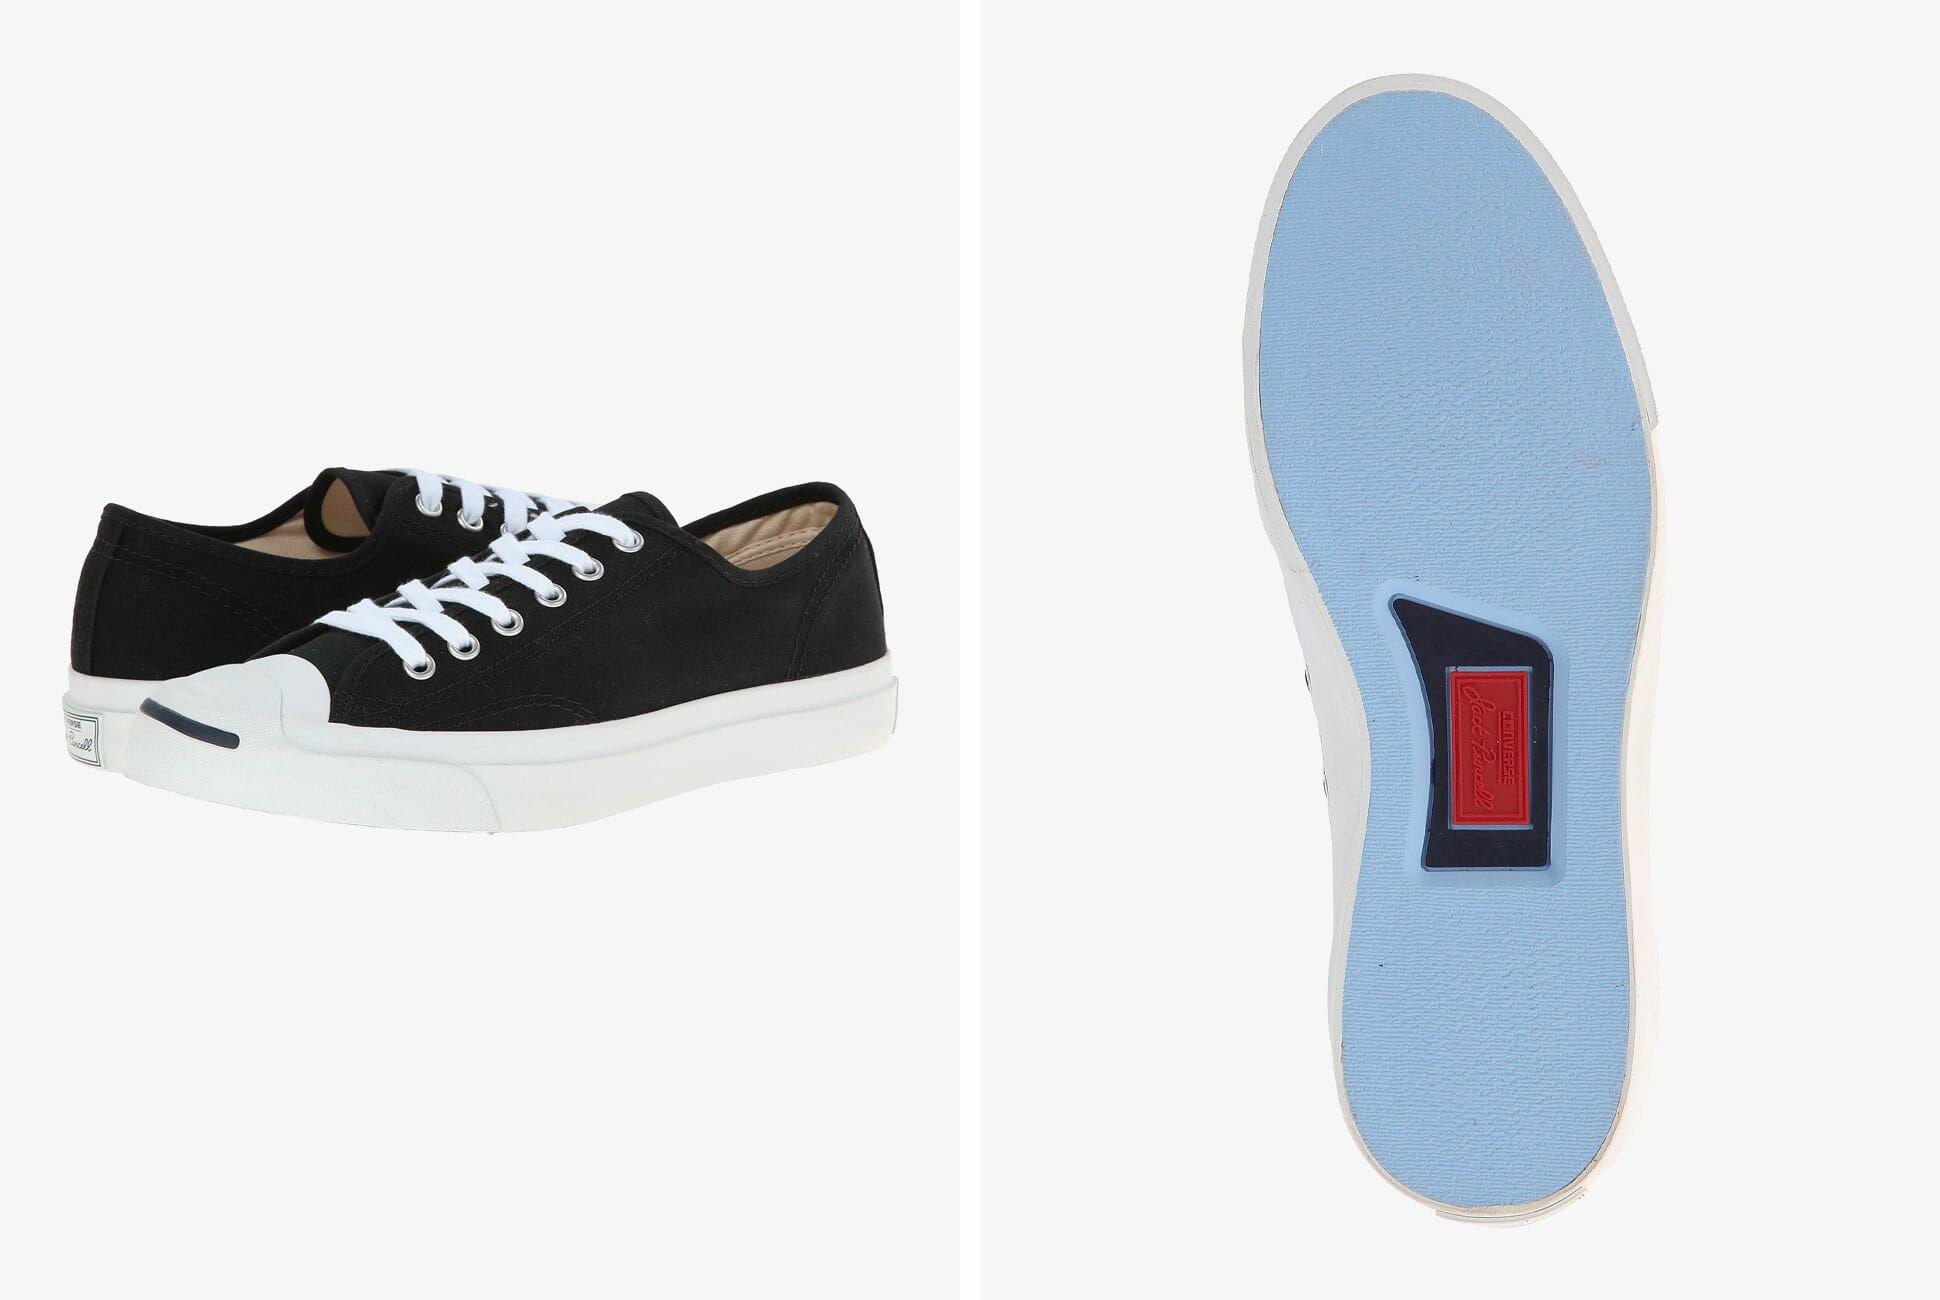 kuuma myynti tehdashinta paras online These Iconic Summer Sneakers Are Now on Sale • Gear Patrol